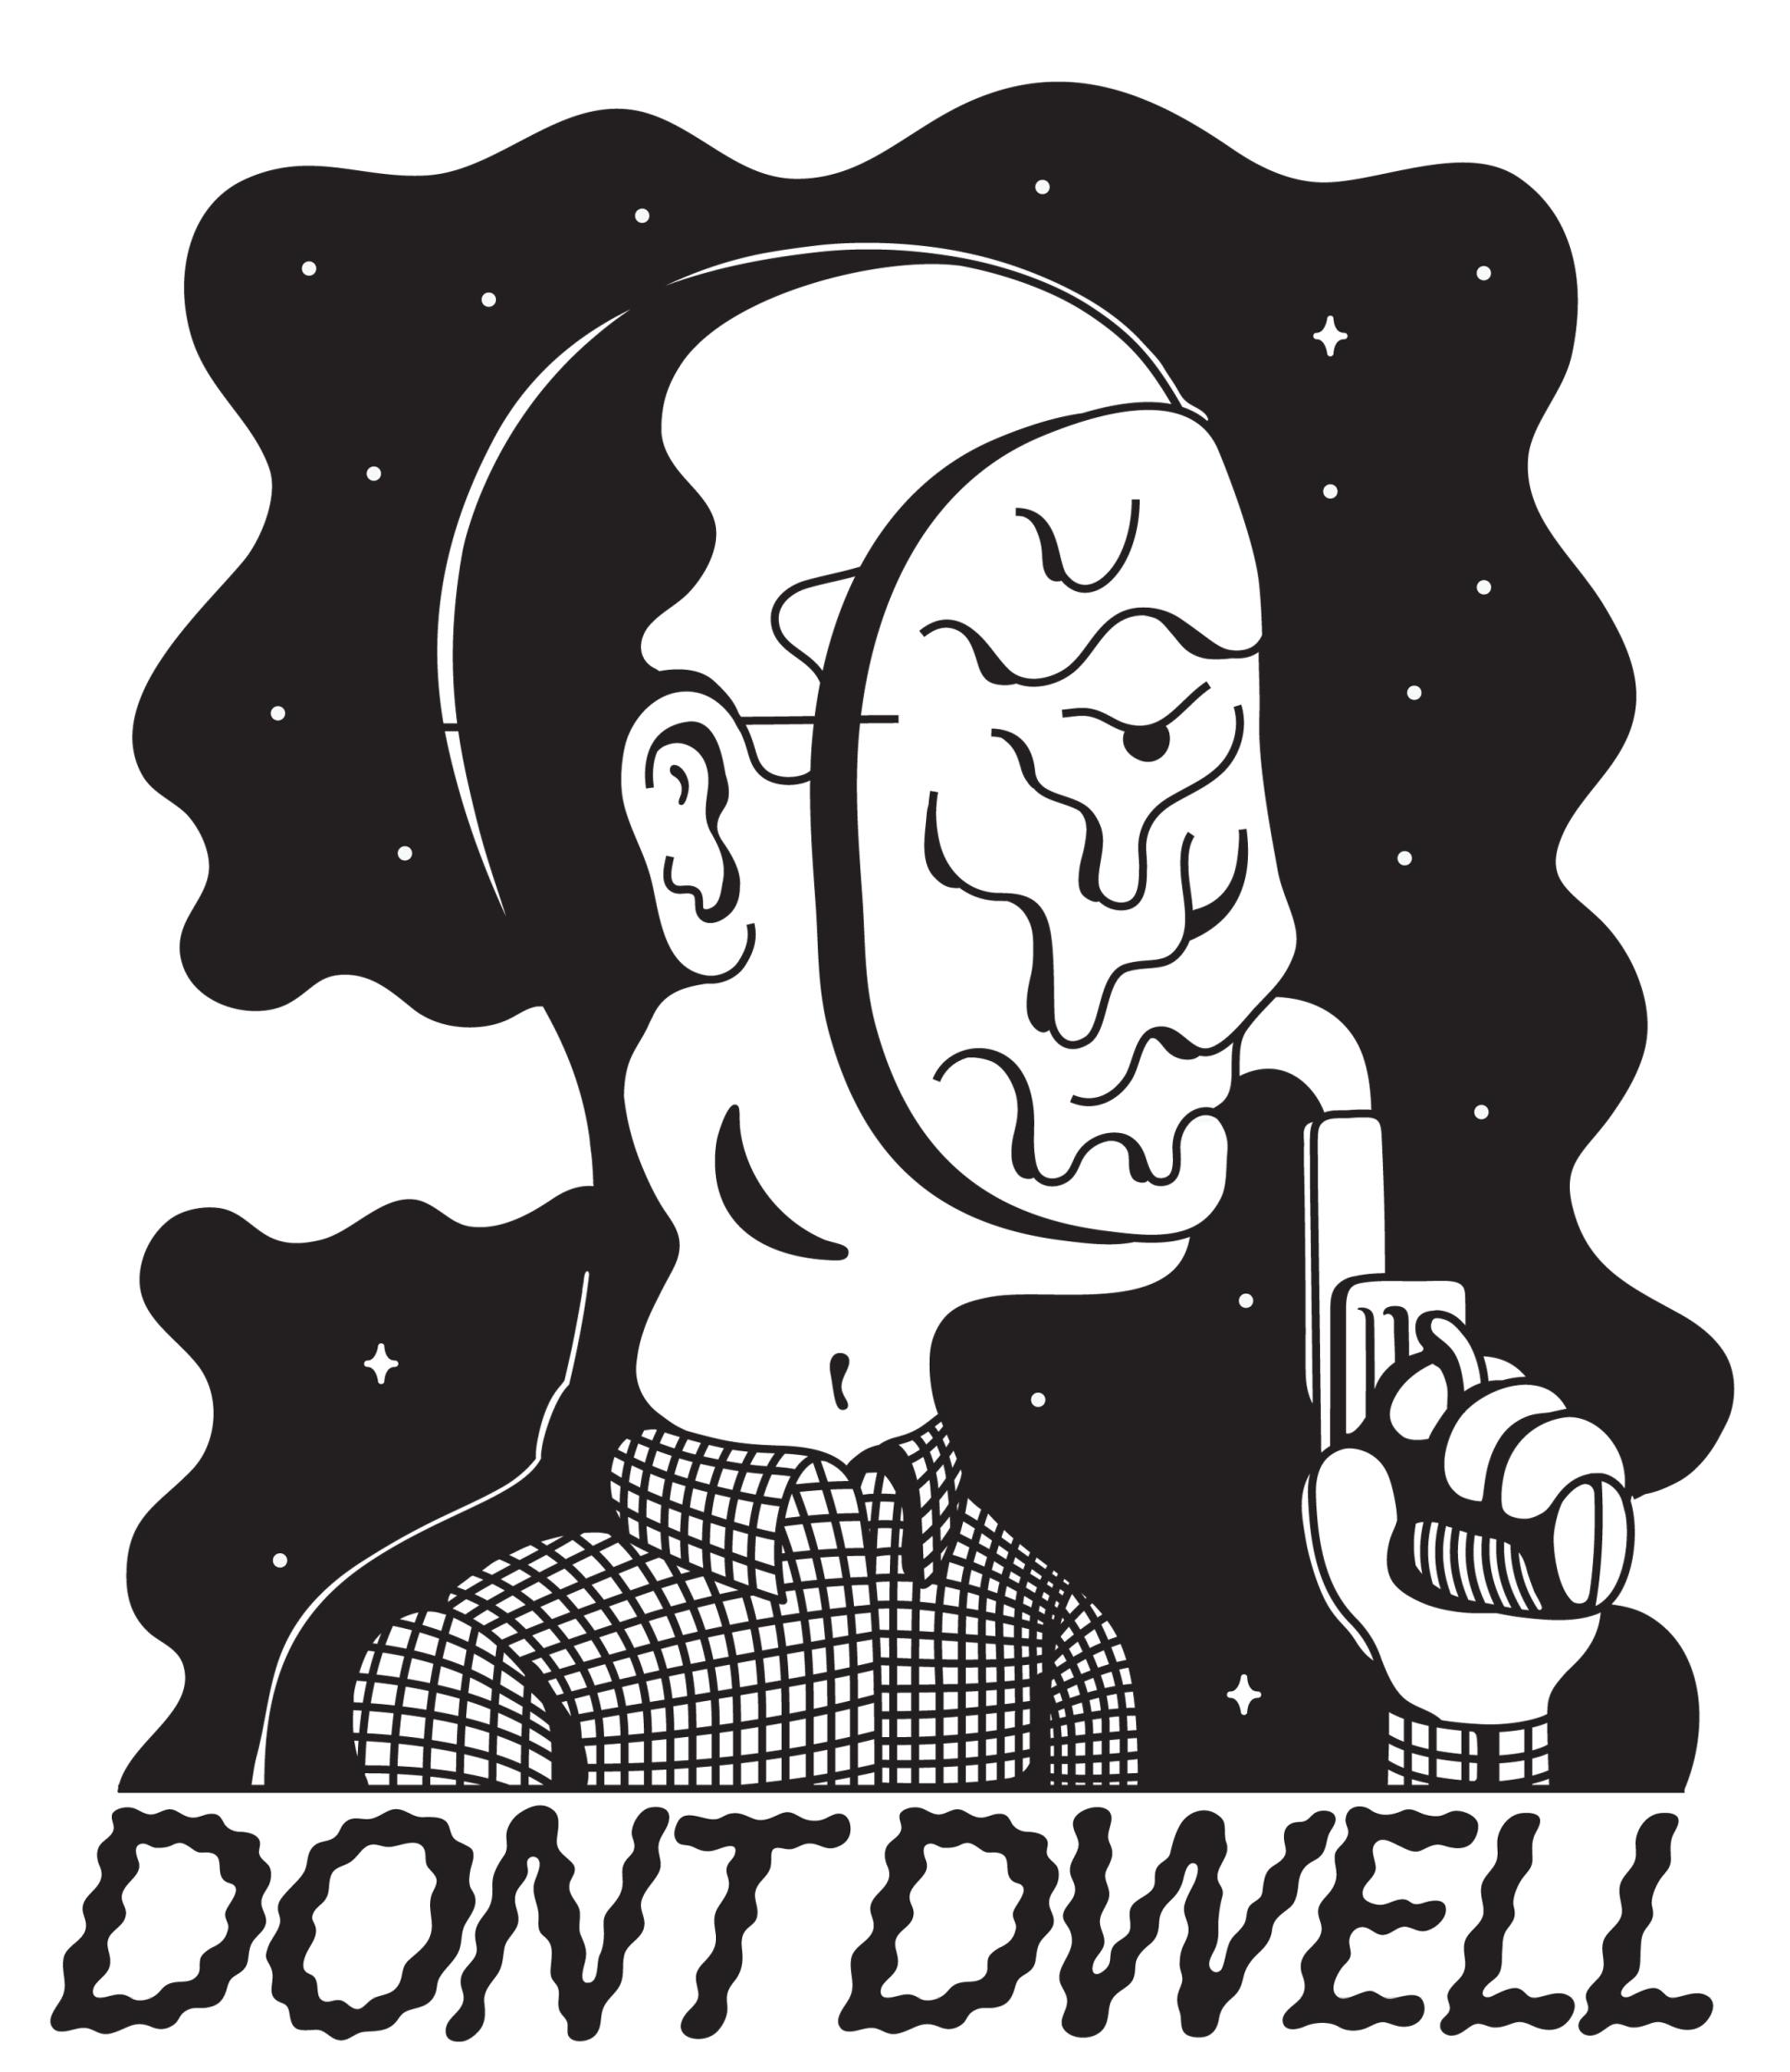 Don't Dwell